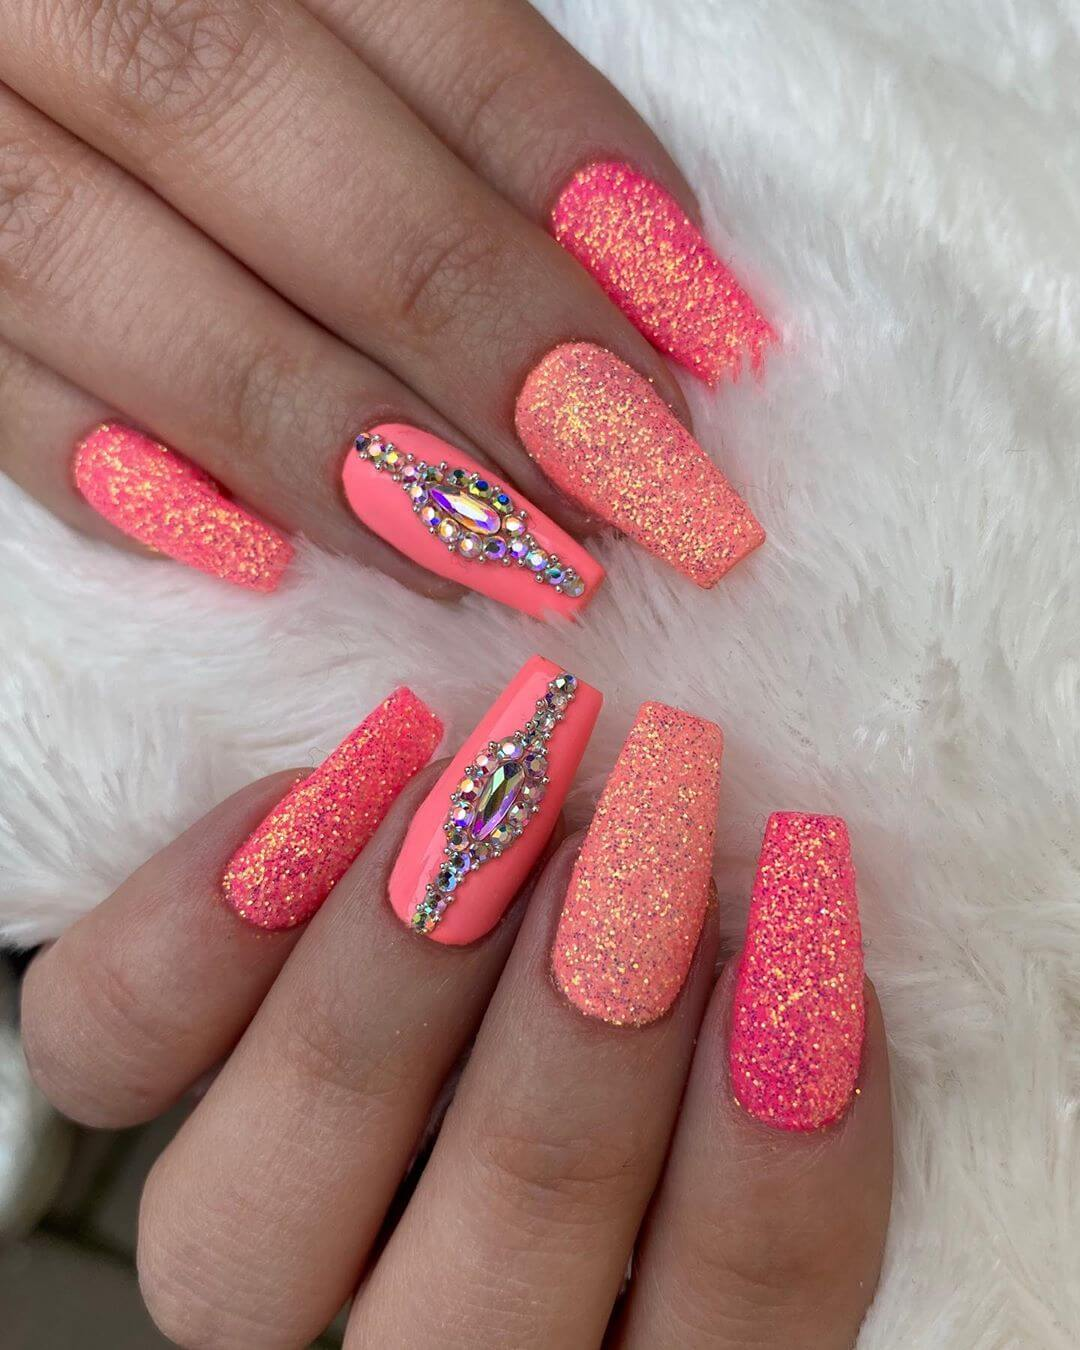 Shades of Pink Rhinestone Nail Art Design